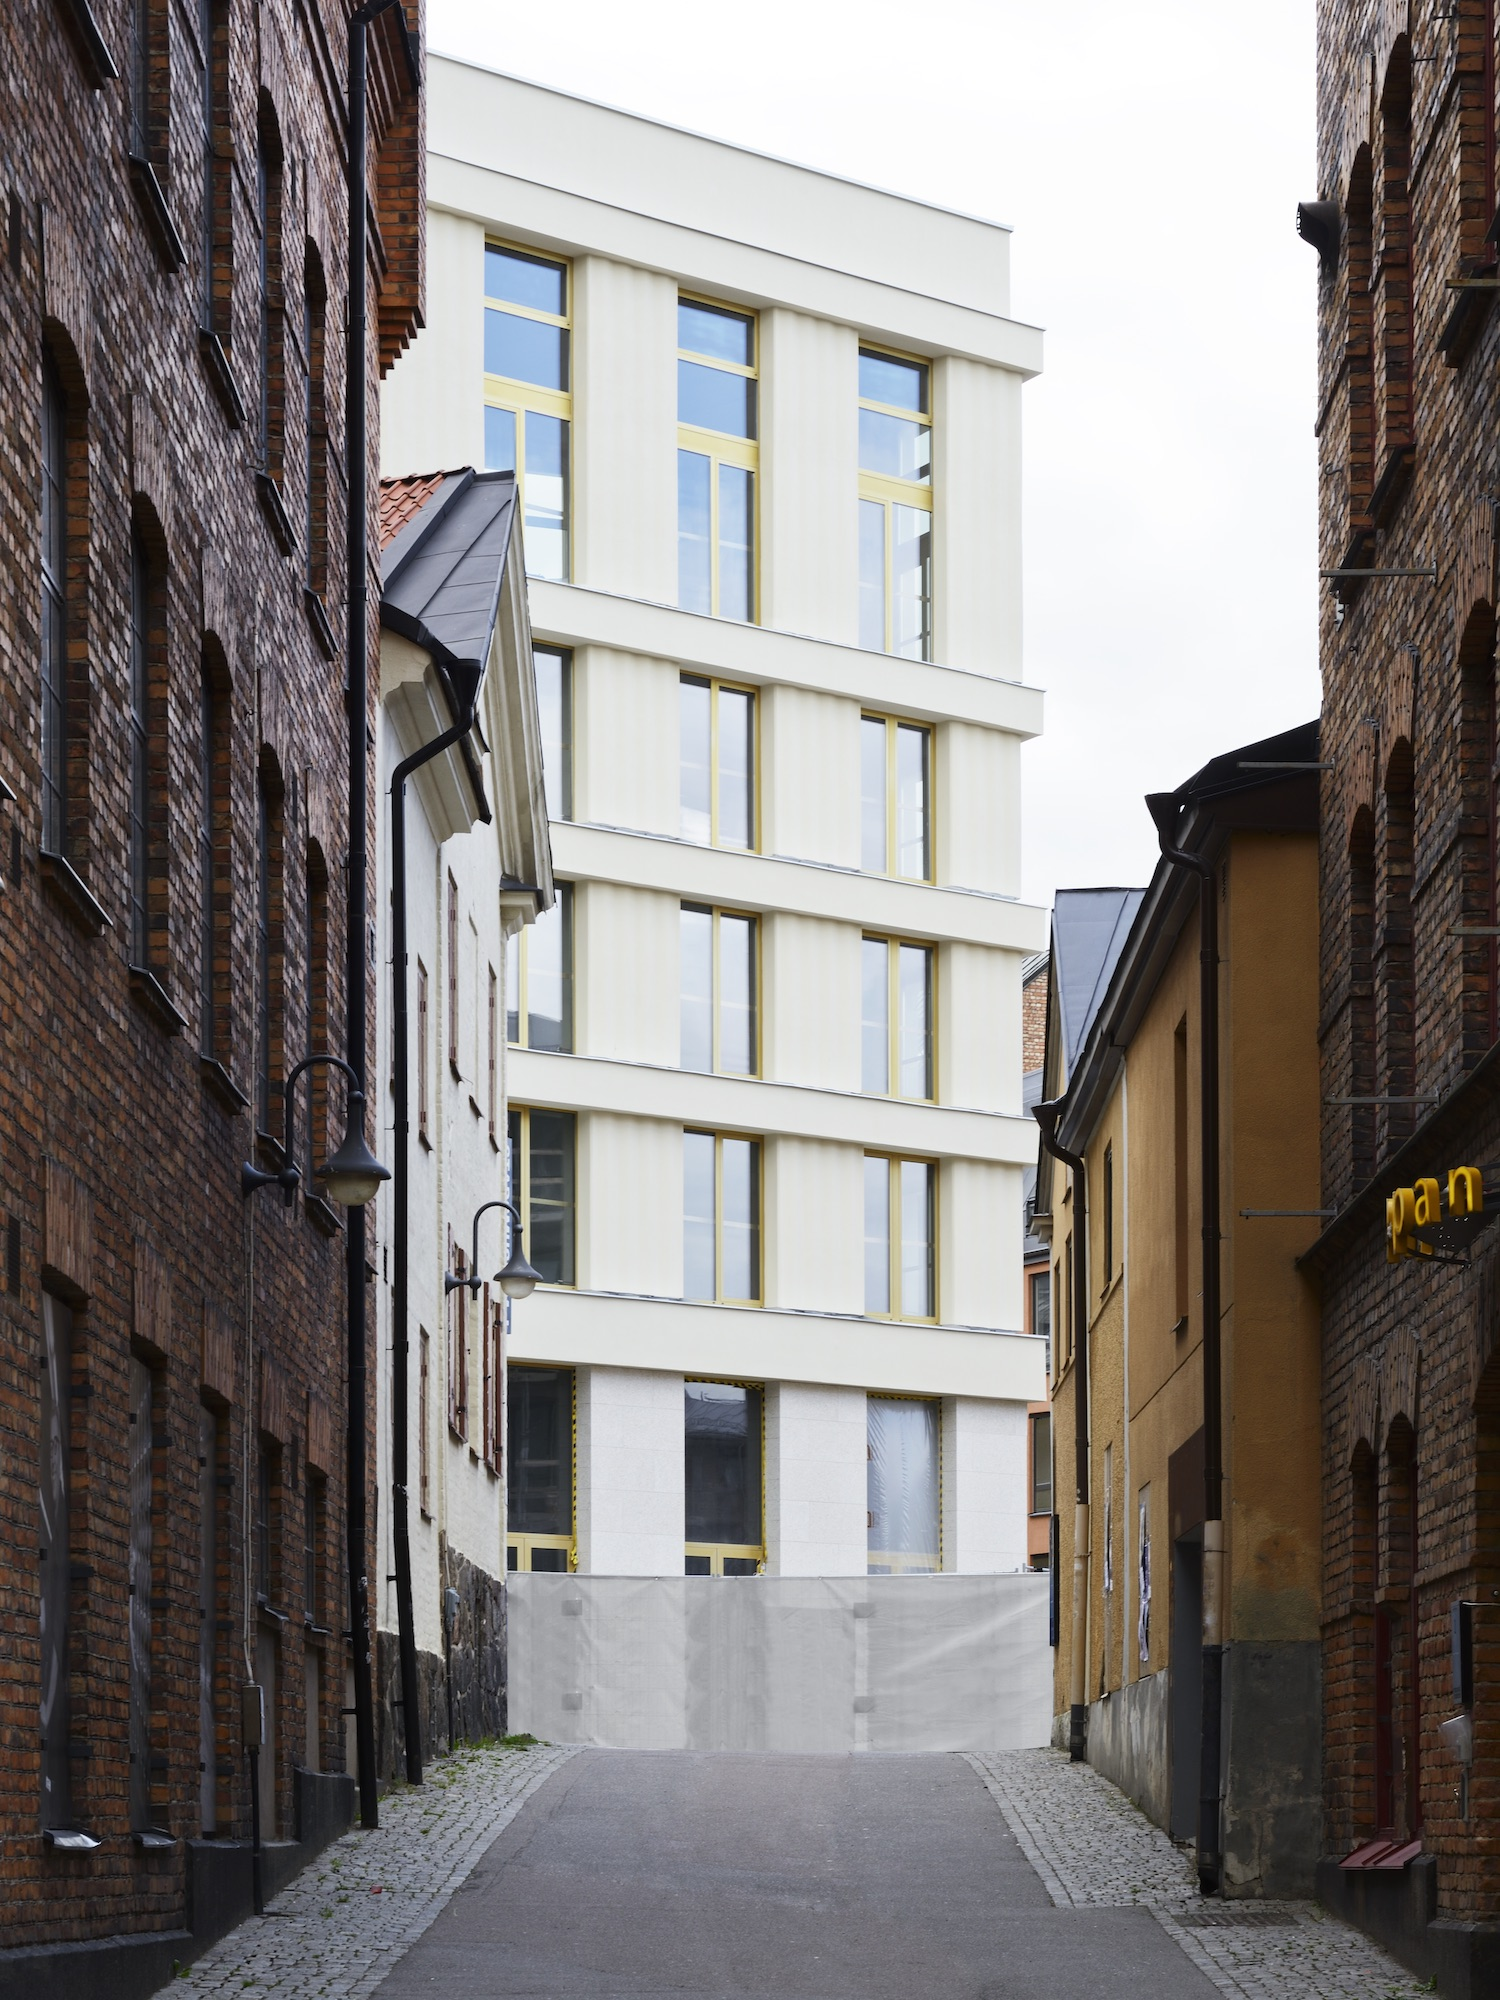 Foto: Mikael Olsson